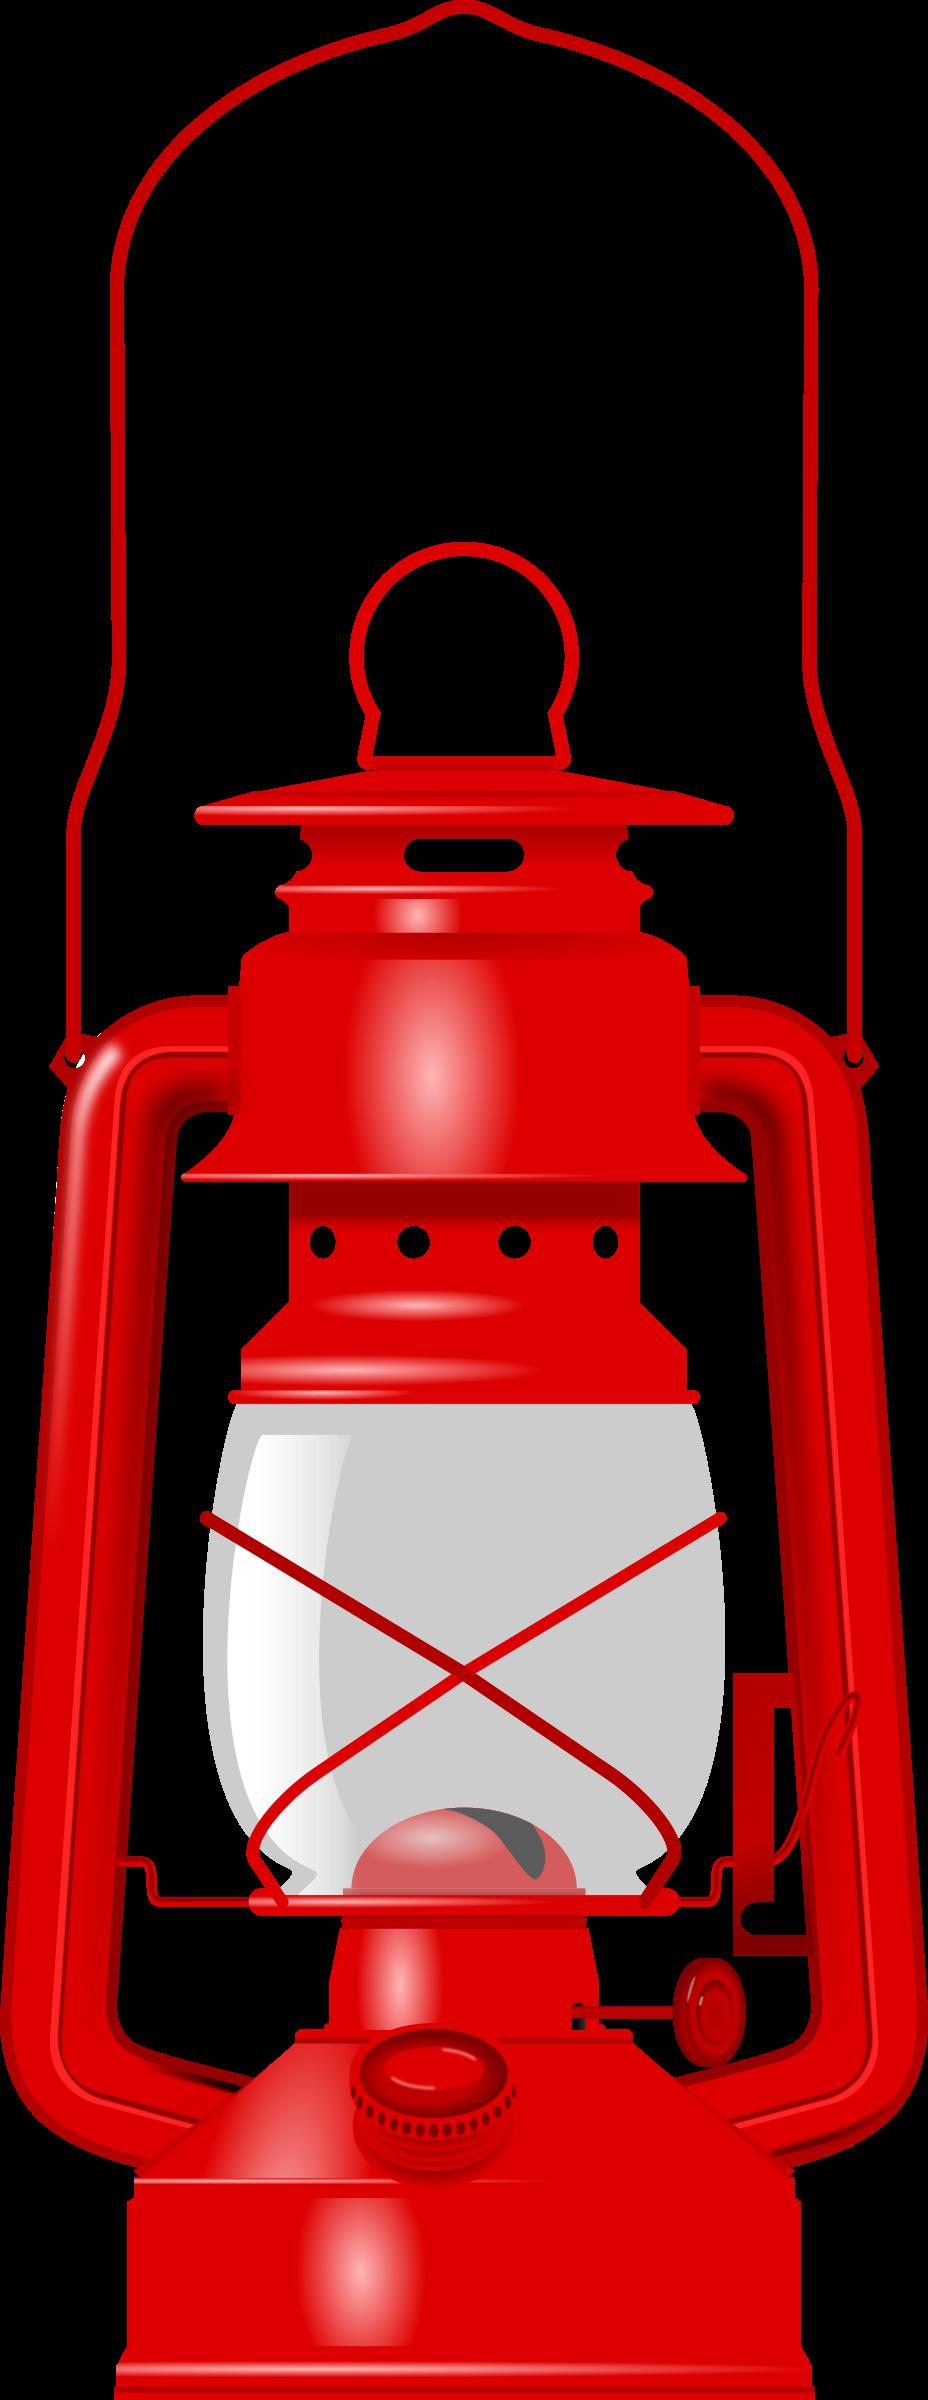 Lantern clipart kerosene lamp Kerosene lamp Kerosene Clipart lamp